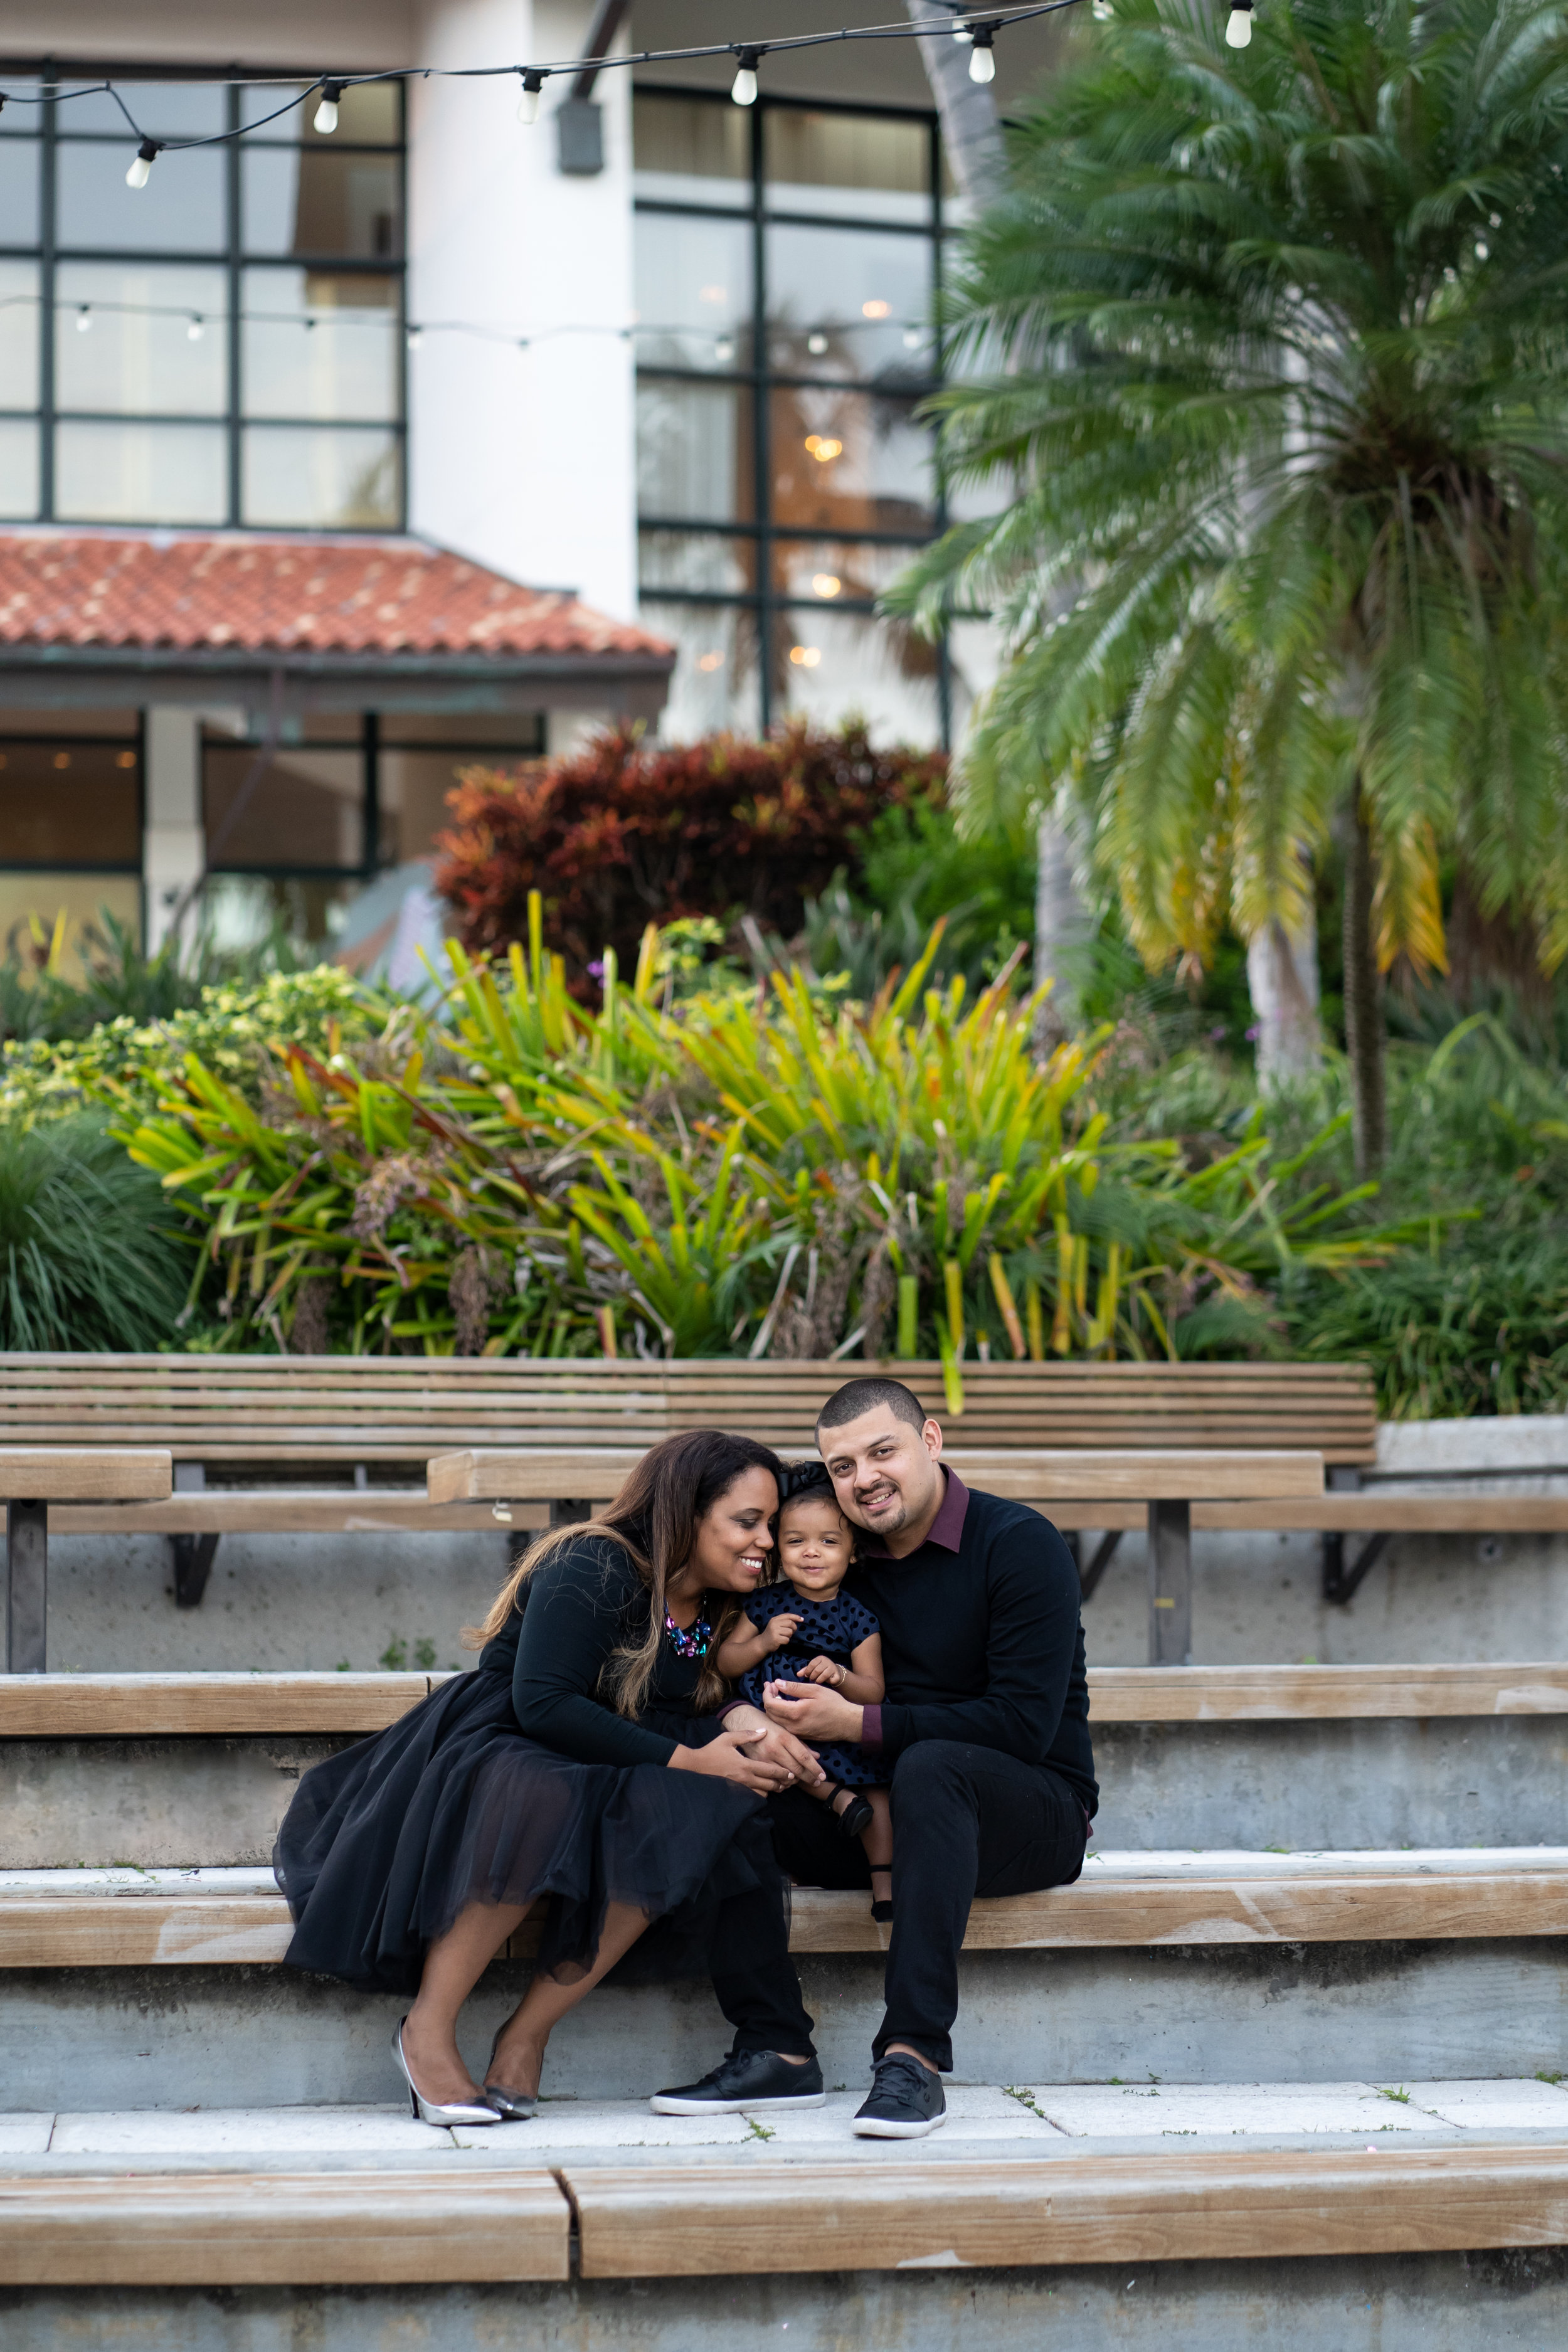 Family of 3 Esplanade Park - Fort Lauderdale Photographer